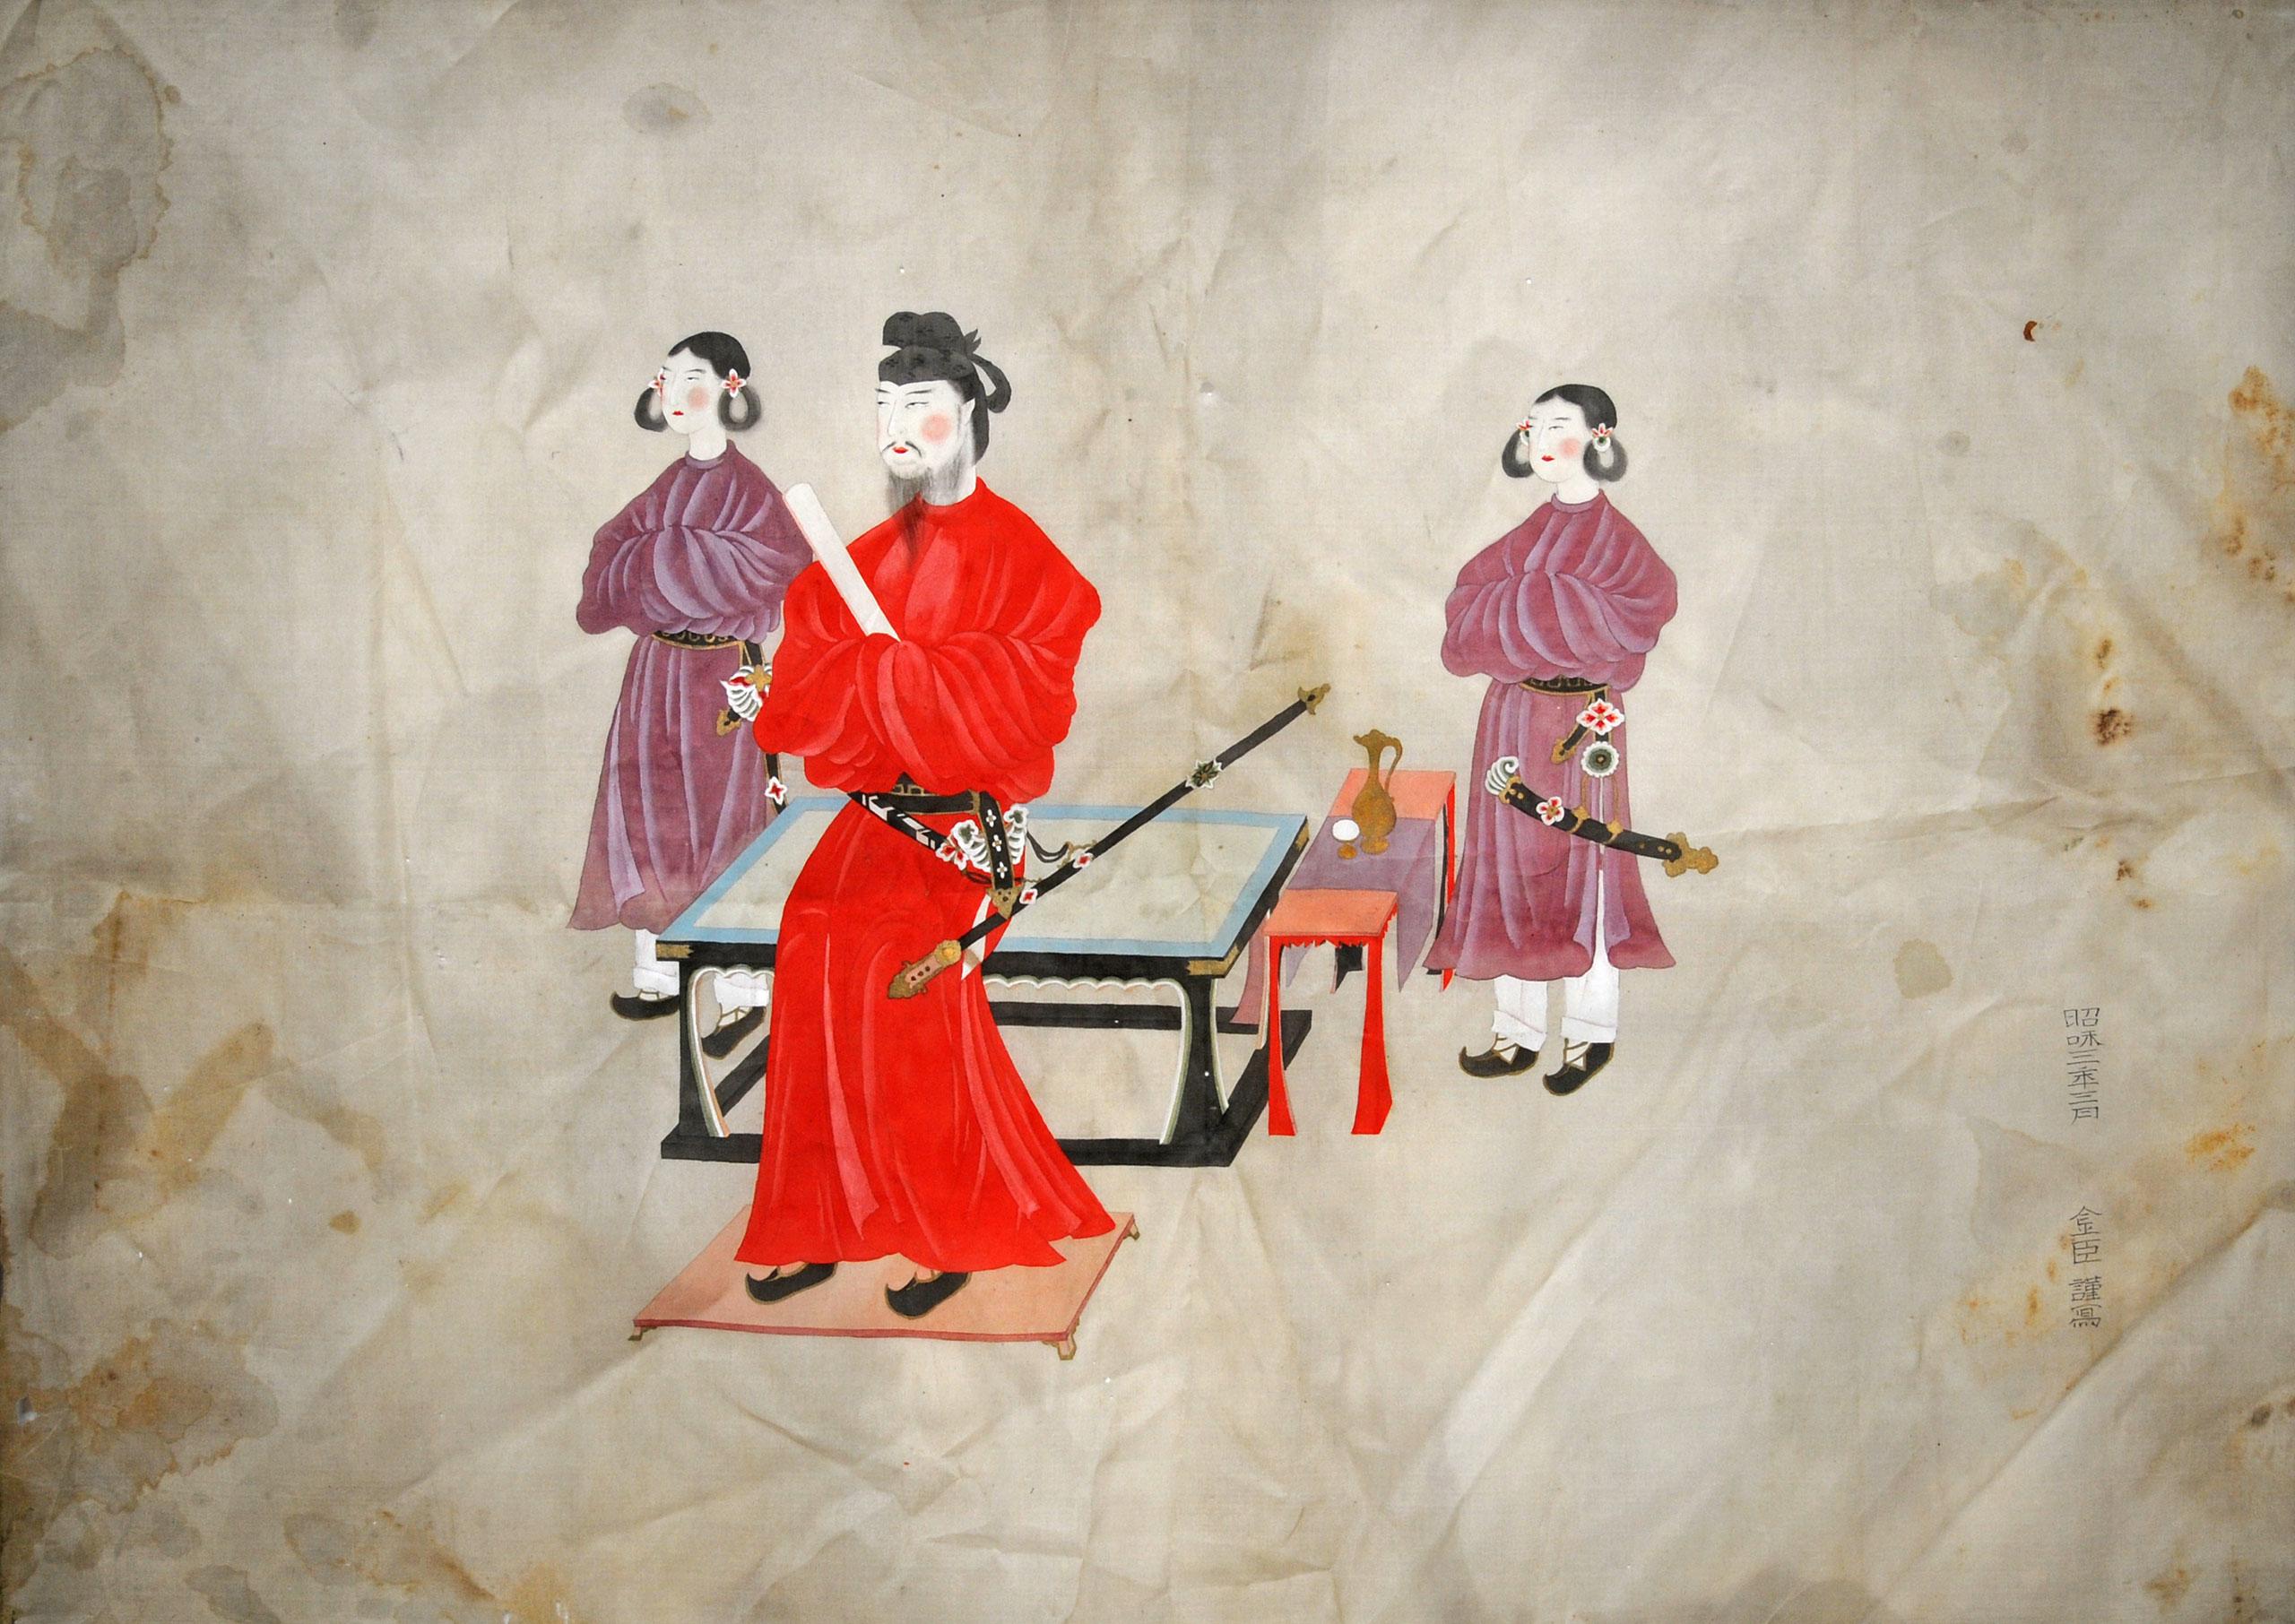 聖徳太子二童子像* - Portrait of Prince Shotoku